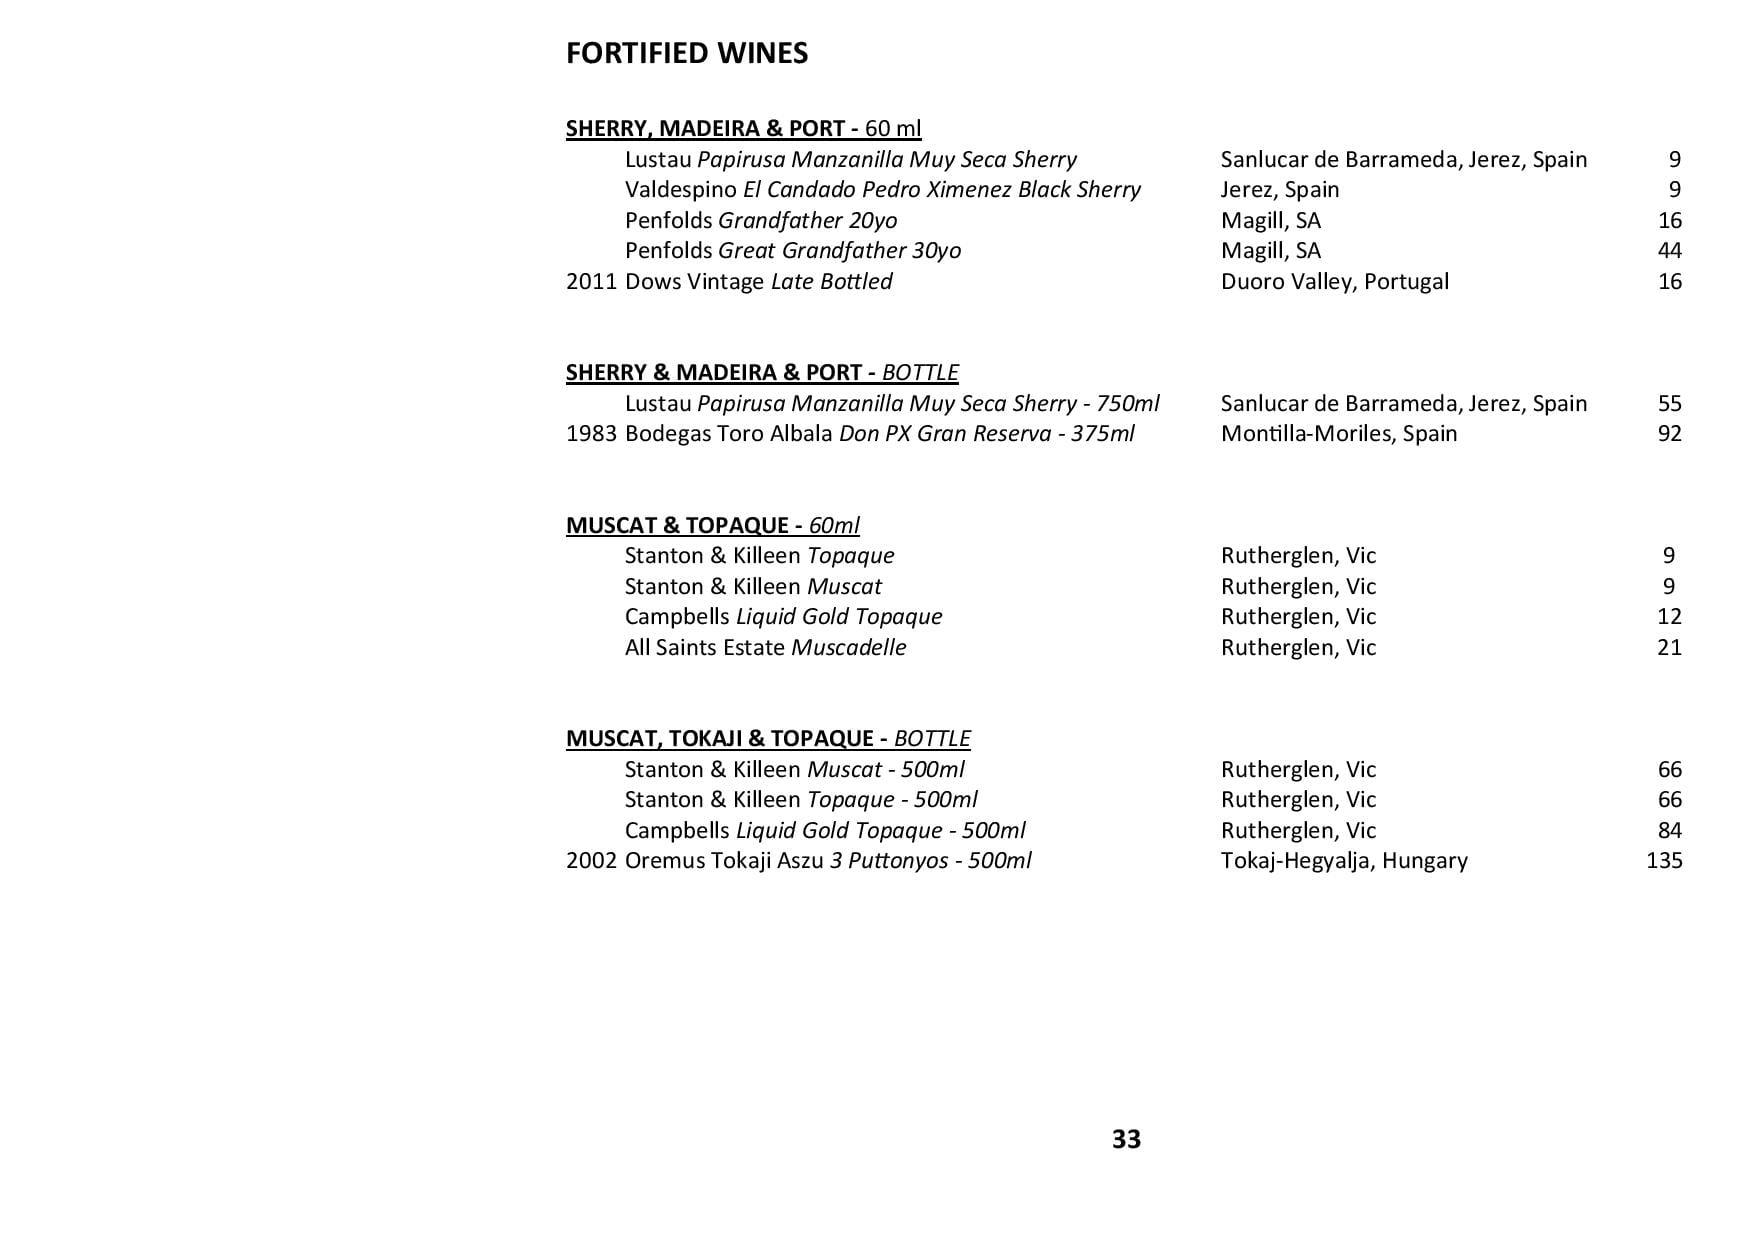 Sails Wine List 2019 Page 033